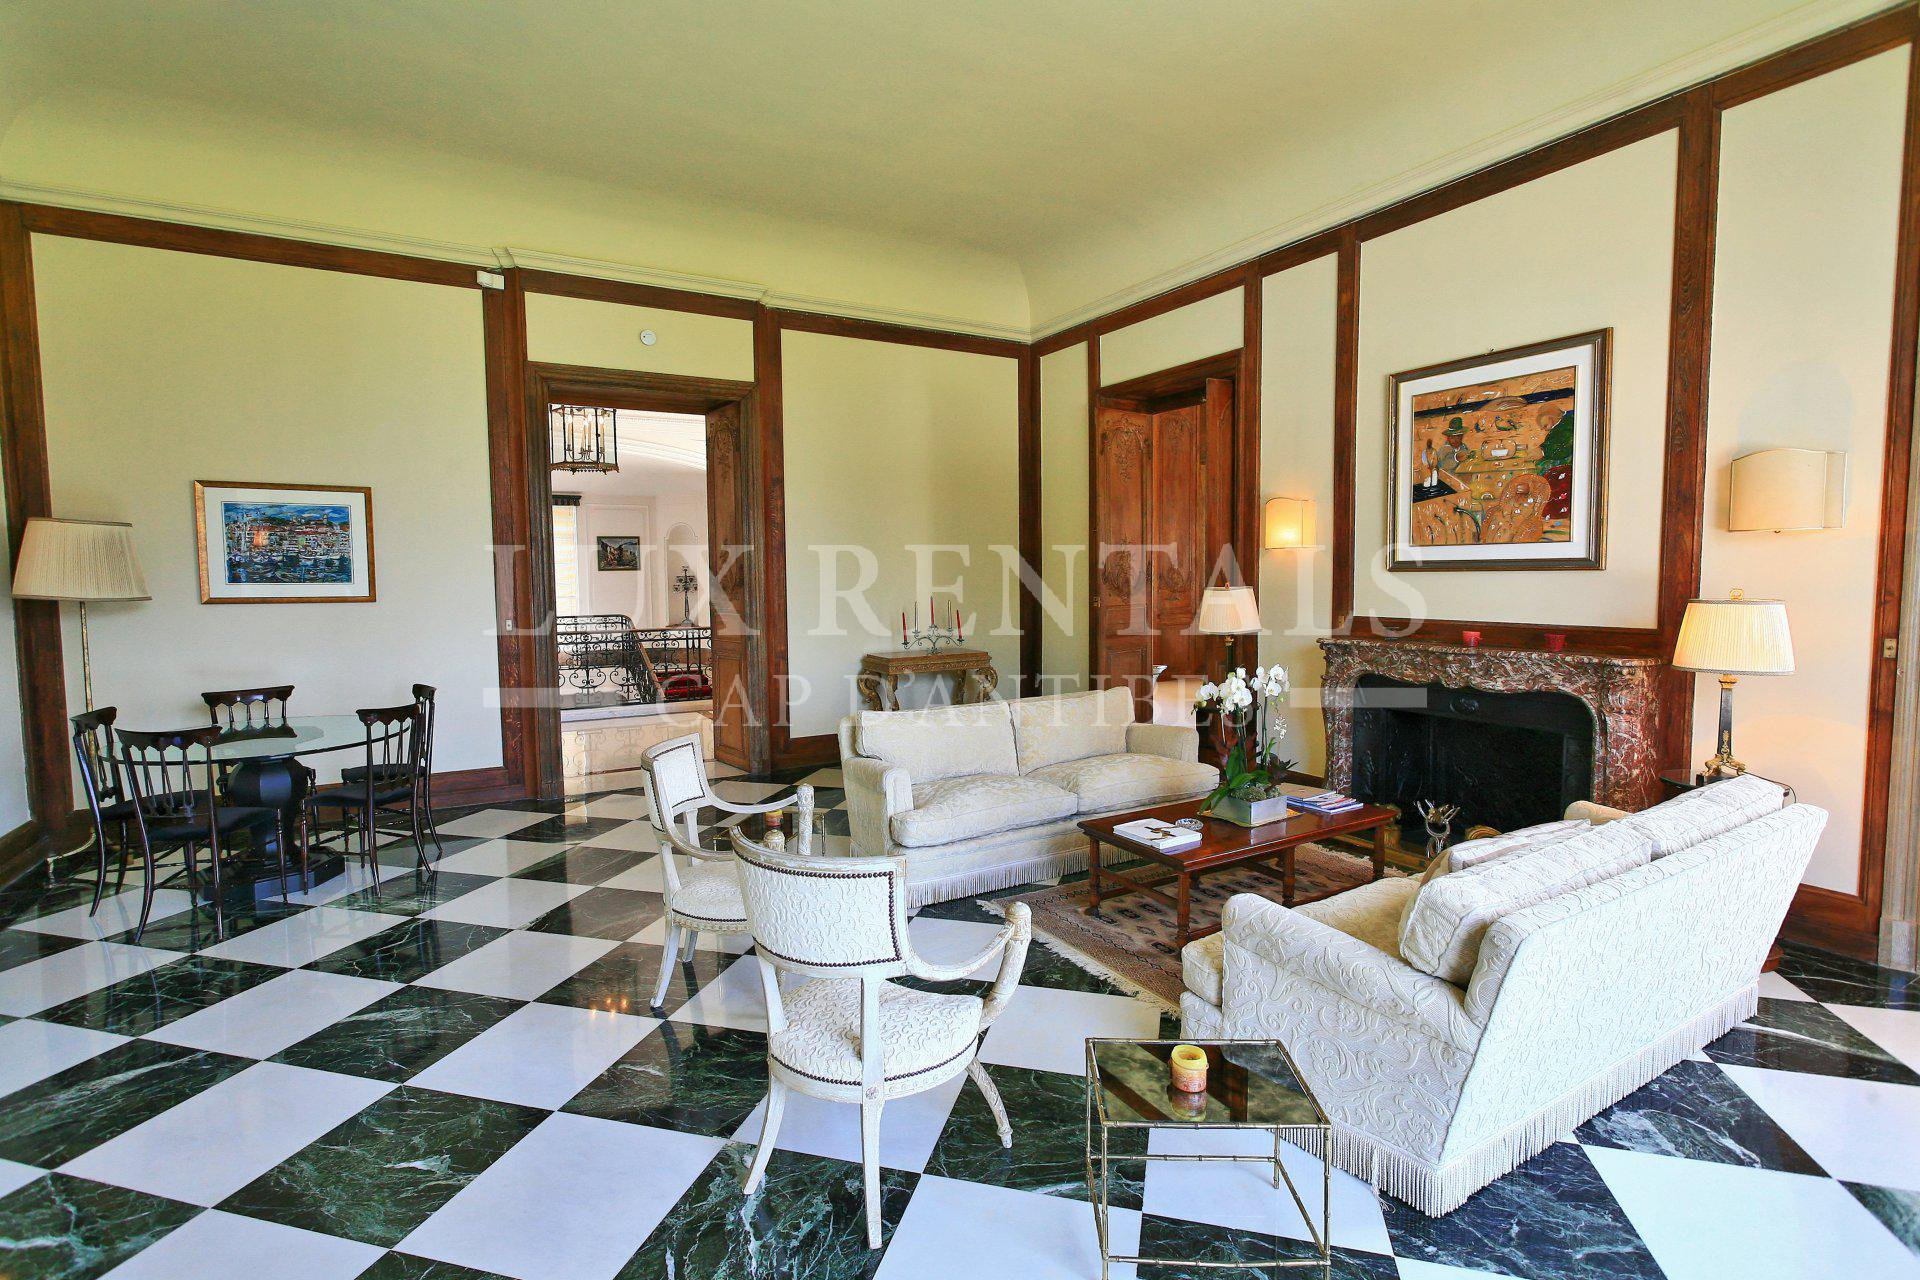 Сезонная аренда Поместье - Кап д'Антиб (Cap d'Antibes)